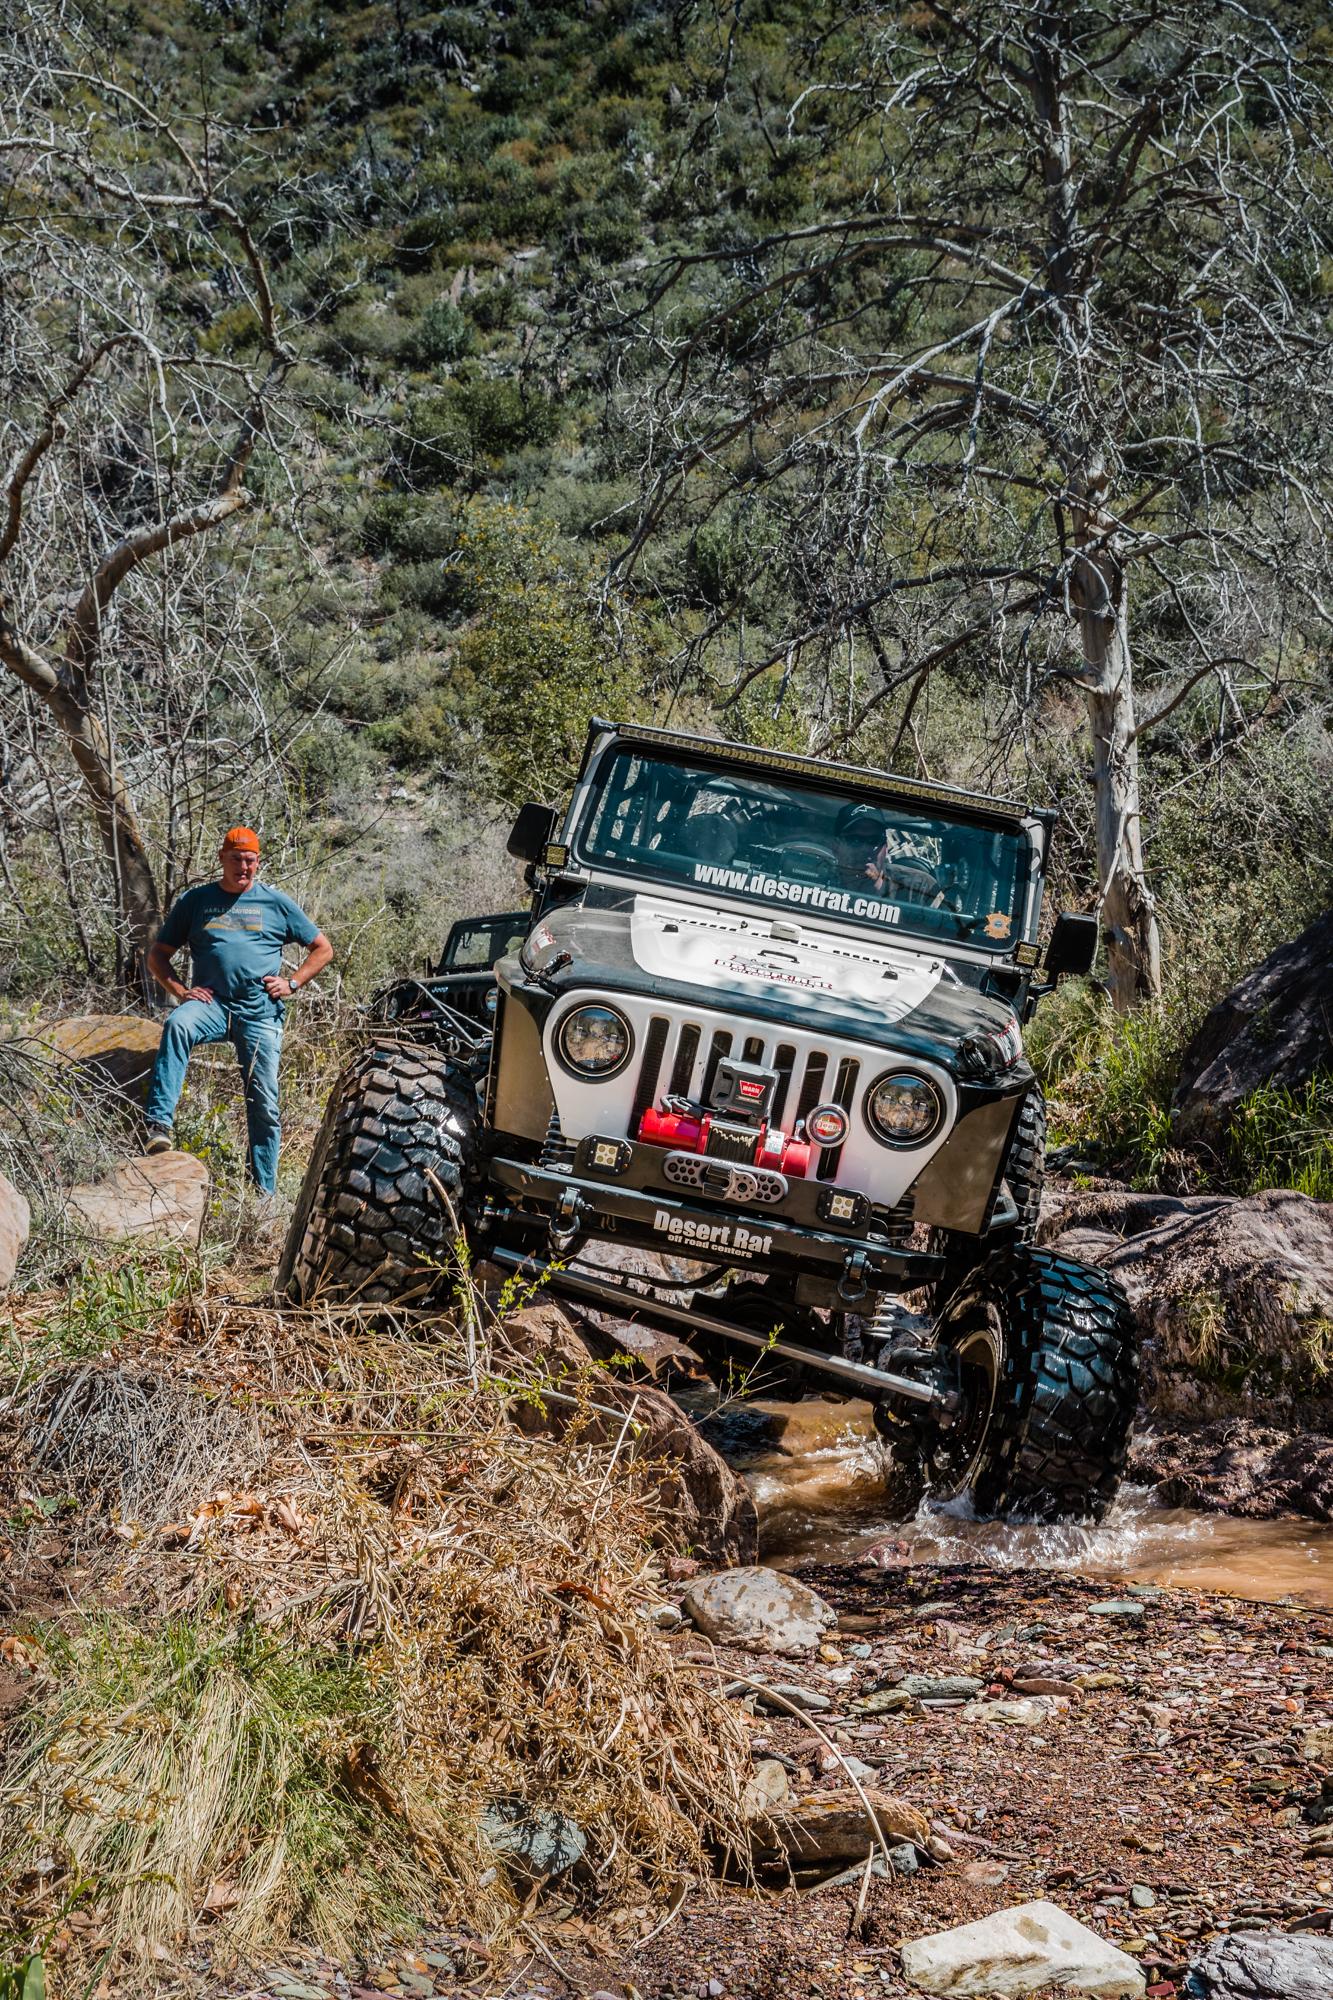 Jeeps Sycamore Creek 3_25_17 WEB-10.jpg